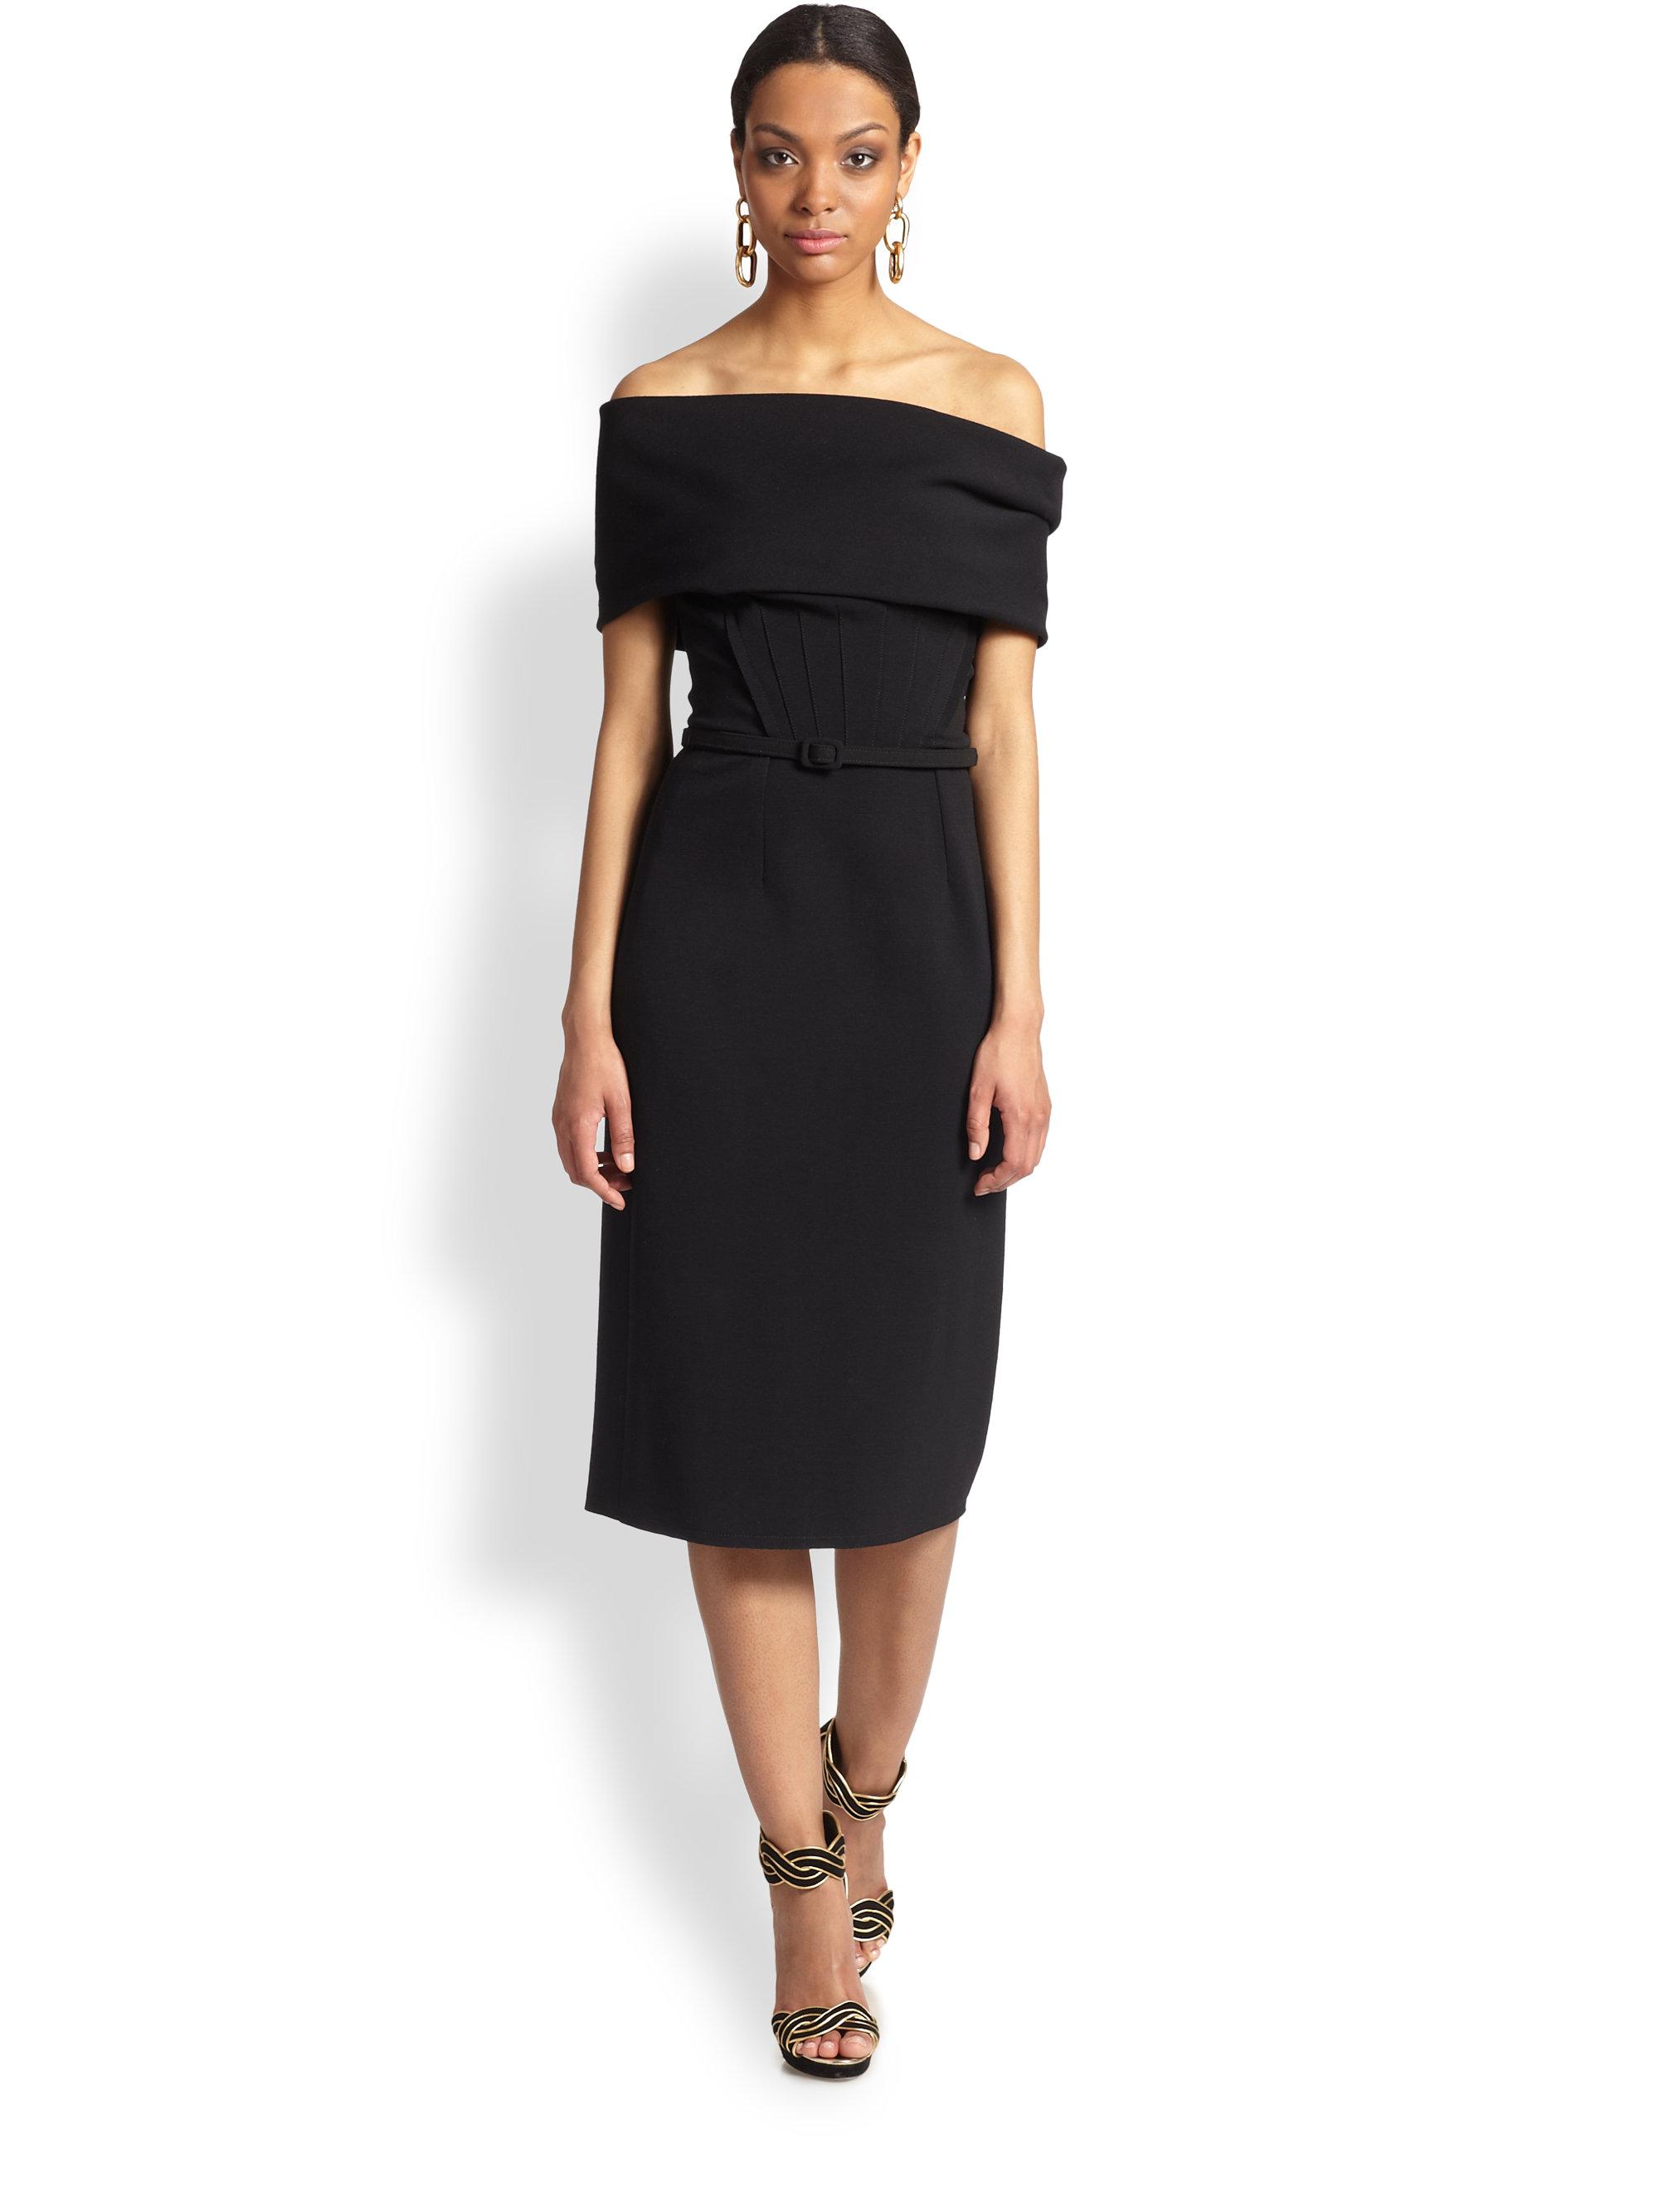 0a4e45e8bf3 Oscar de la Renta Off-The-Shoulder Silk Dress in Black - Lyst